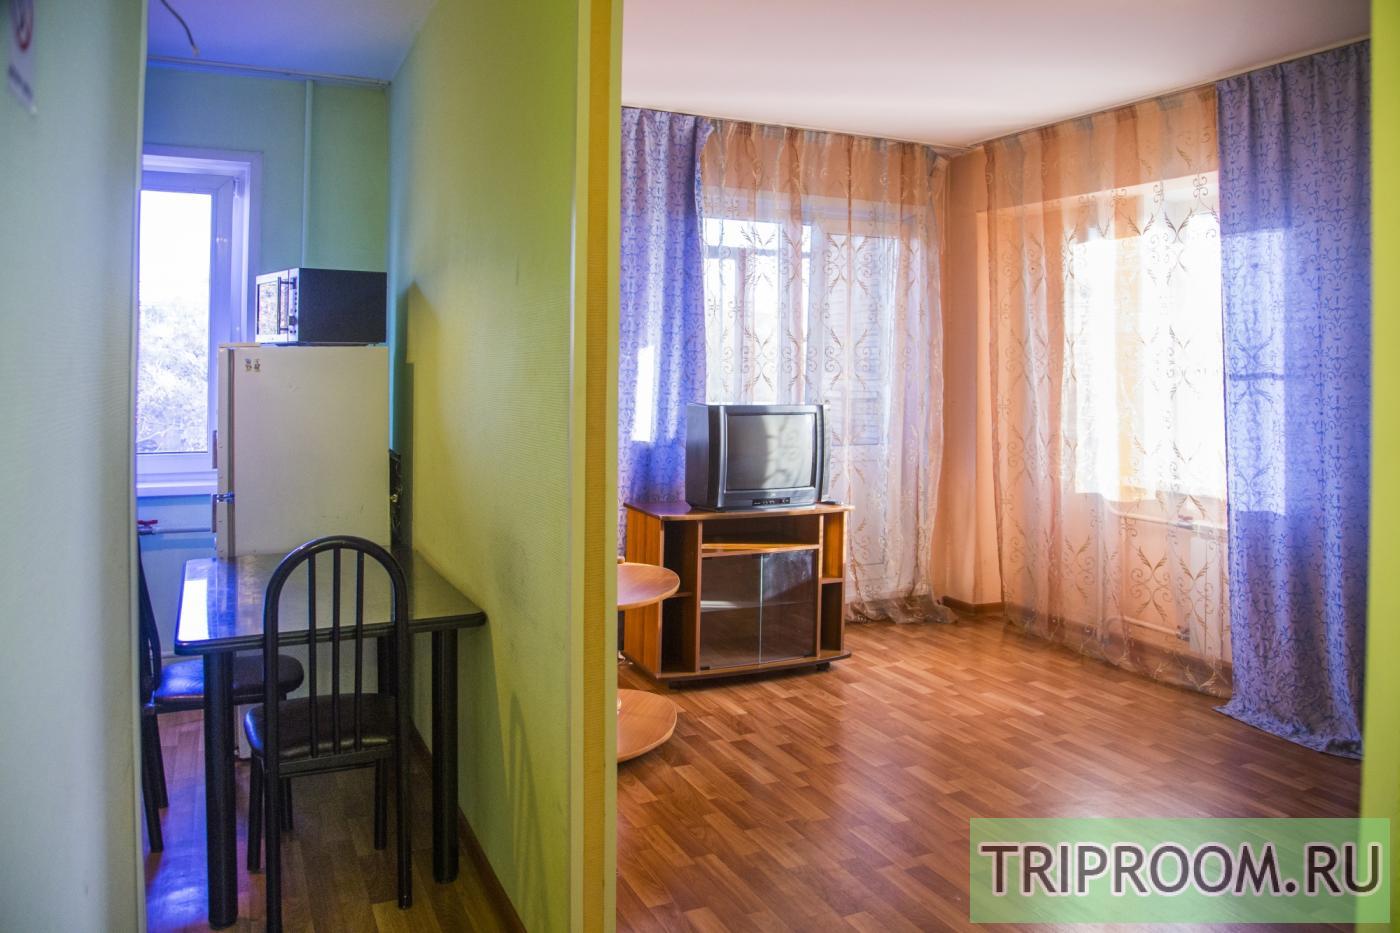 1-комнатная квартира посуточно (вариант № 6615), ул. Александра Матросова улица, фото № 7